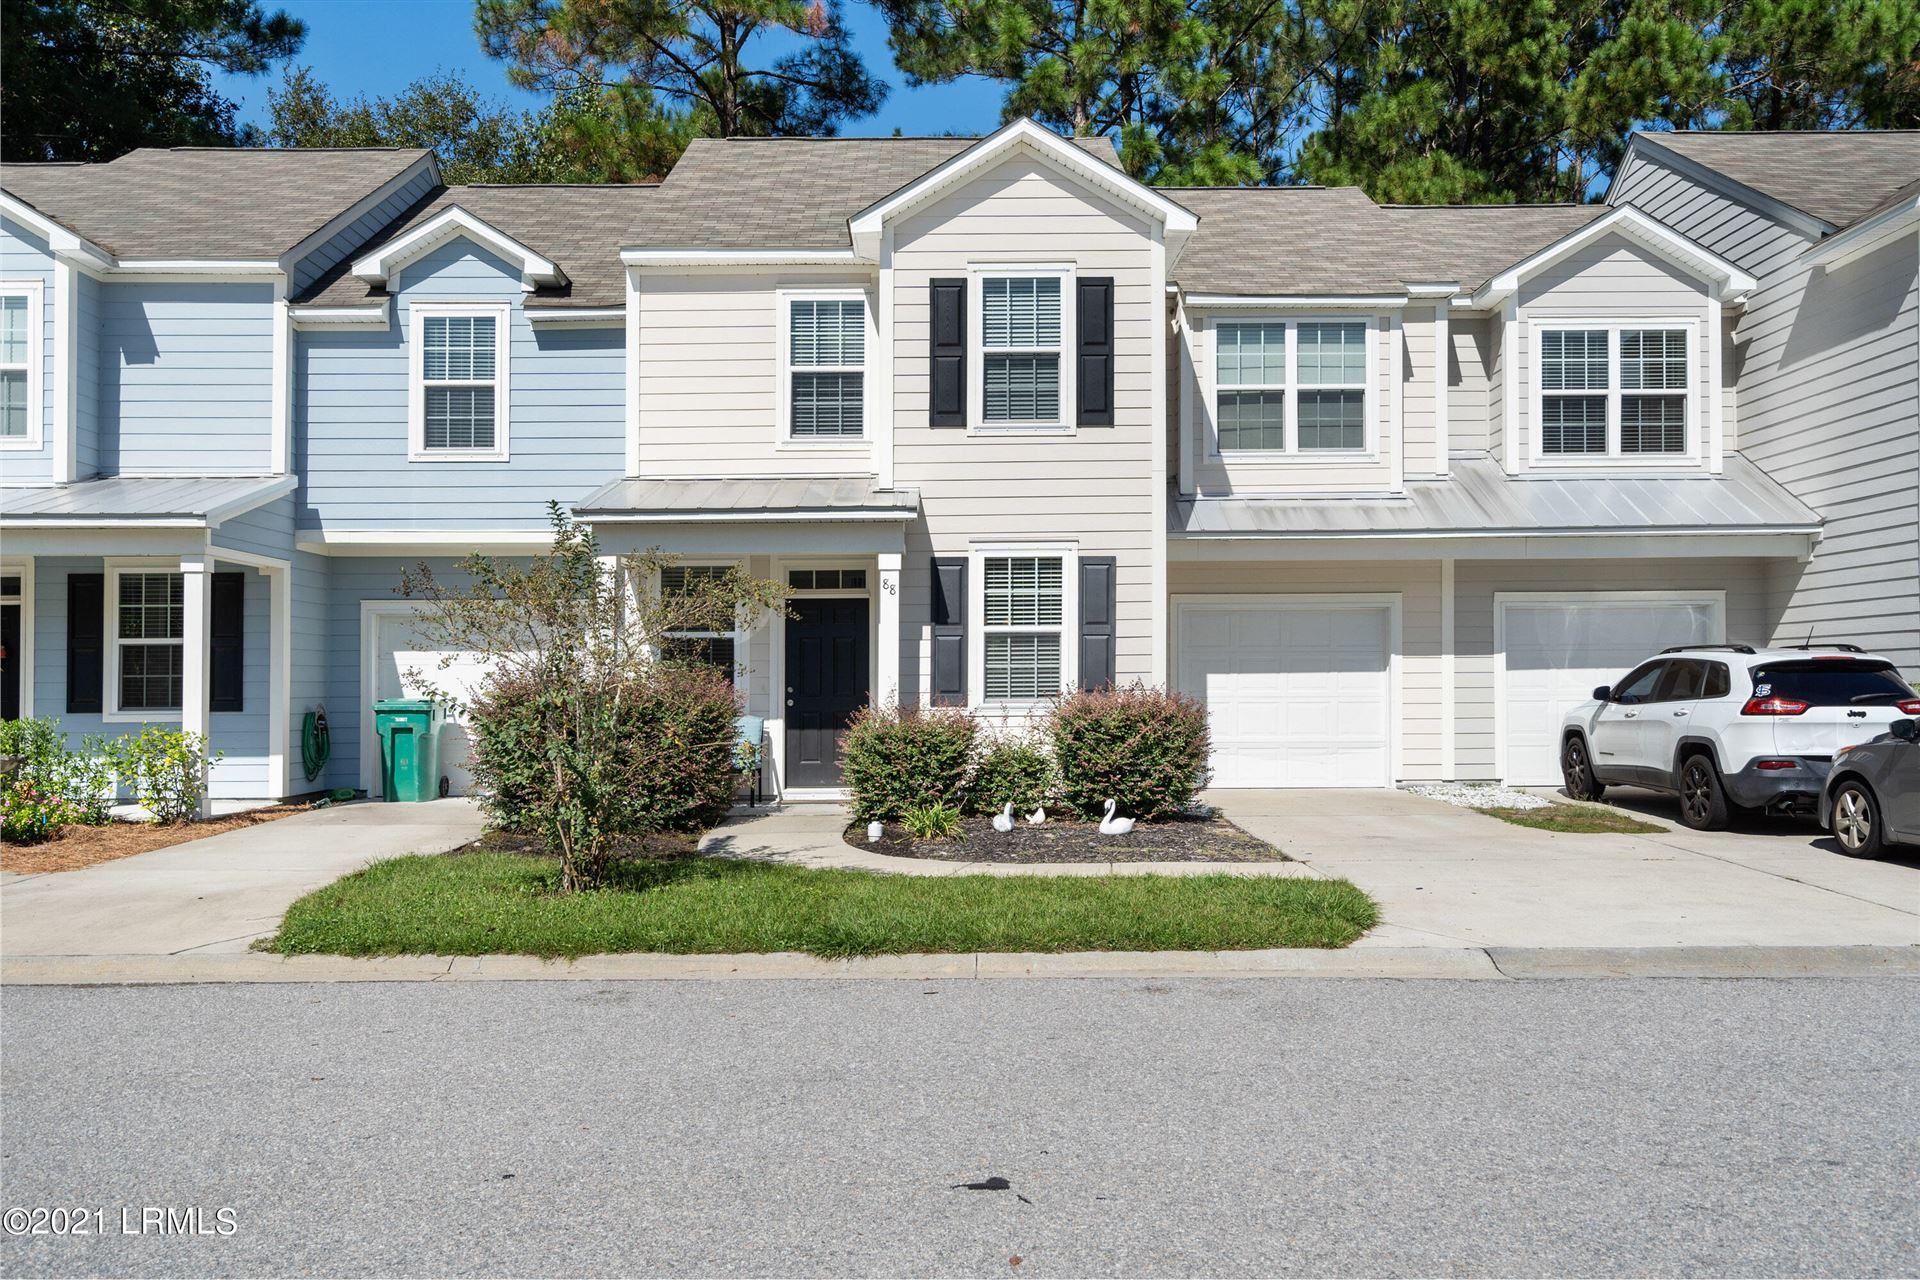 88 Plumgrass Street, Bluffton, SC 29910 - MLS#: 173308